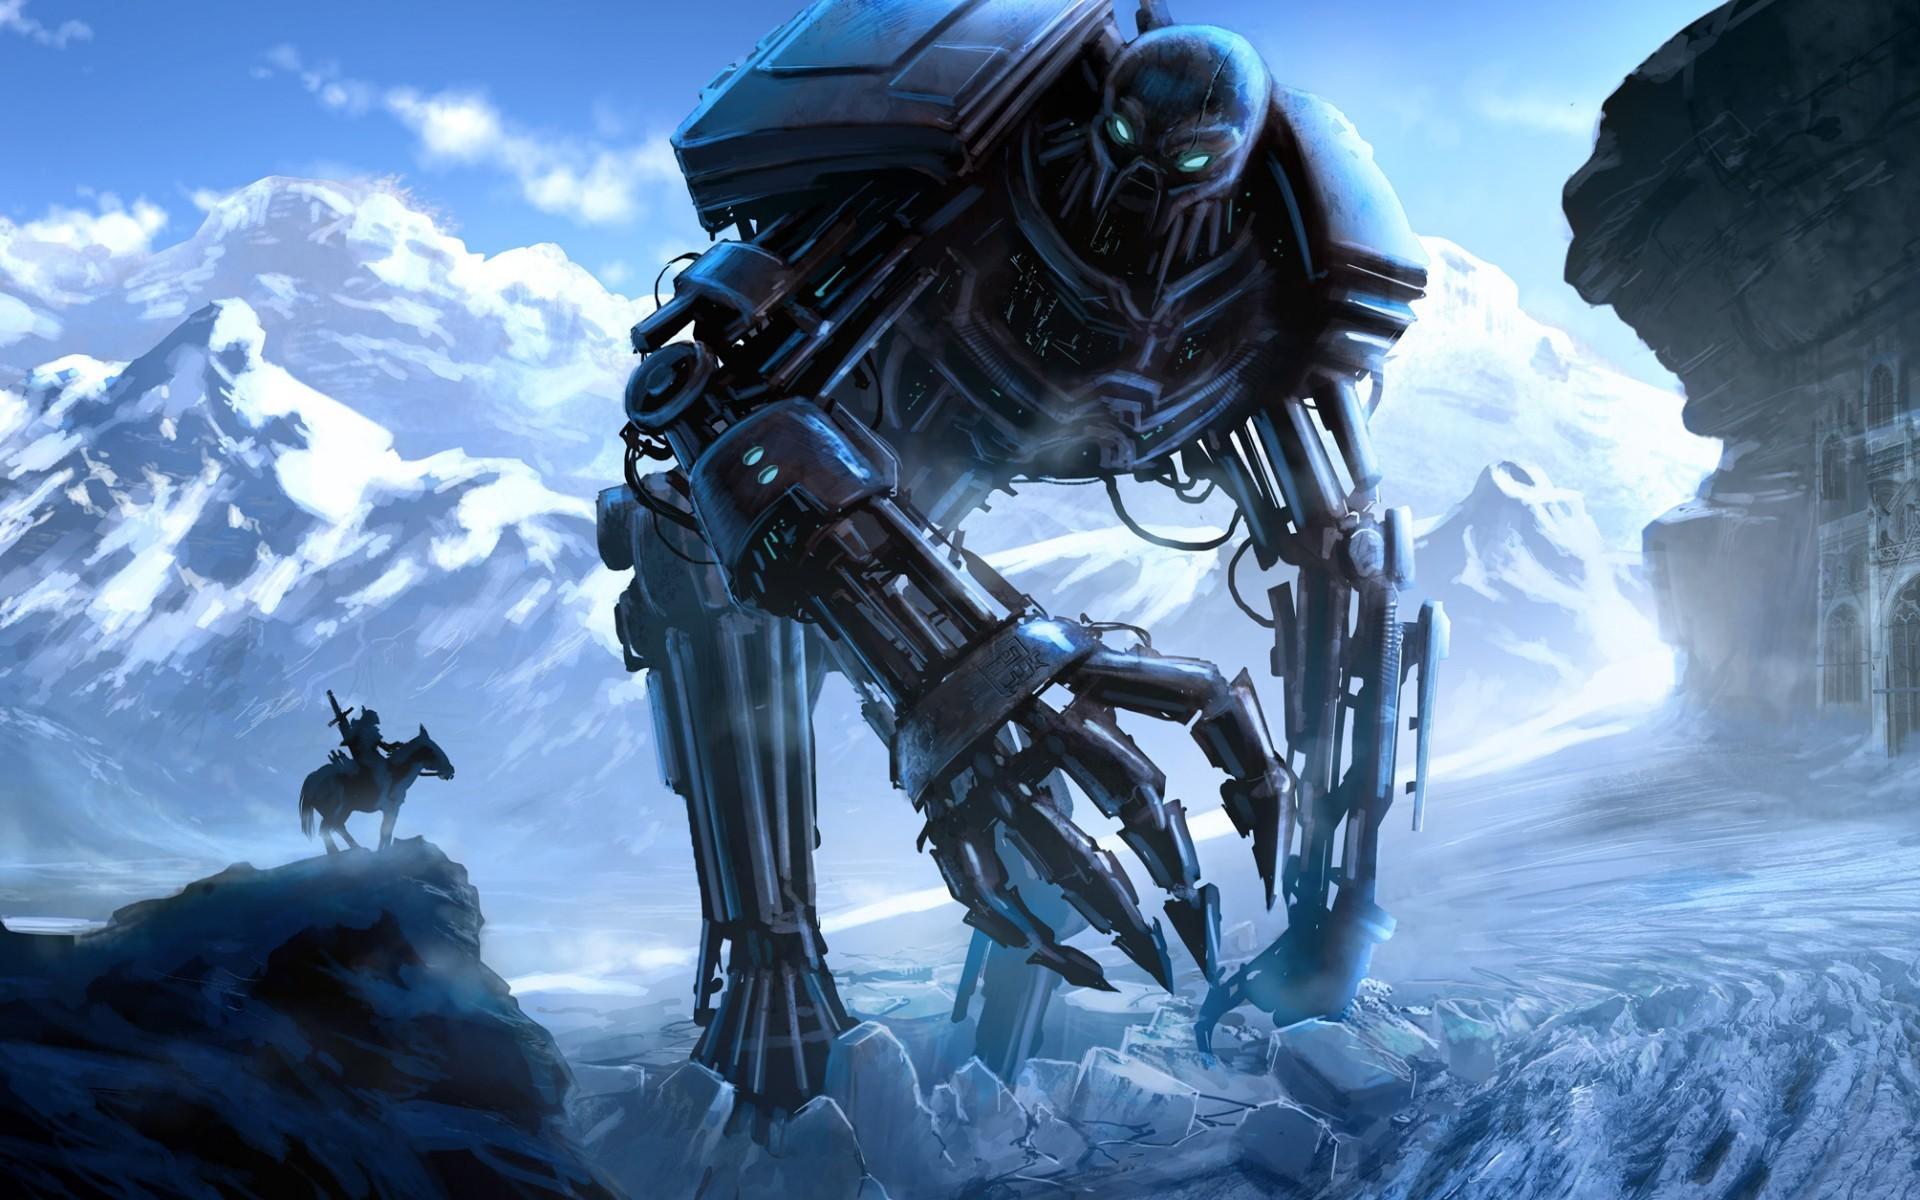 wallpaper fantasy art robot snow winter ice science fiction